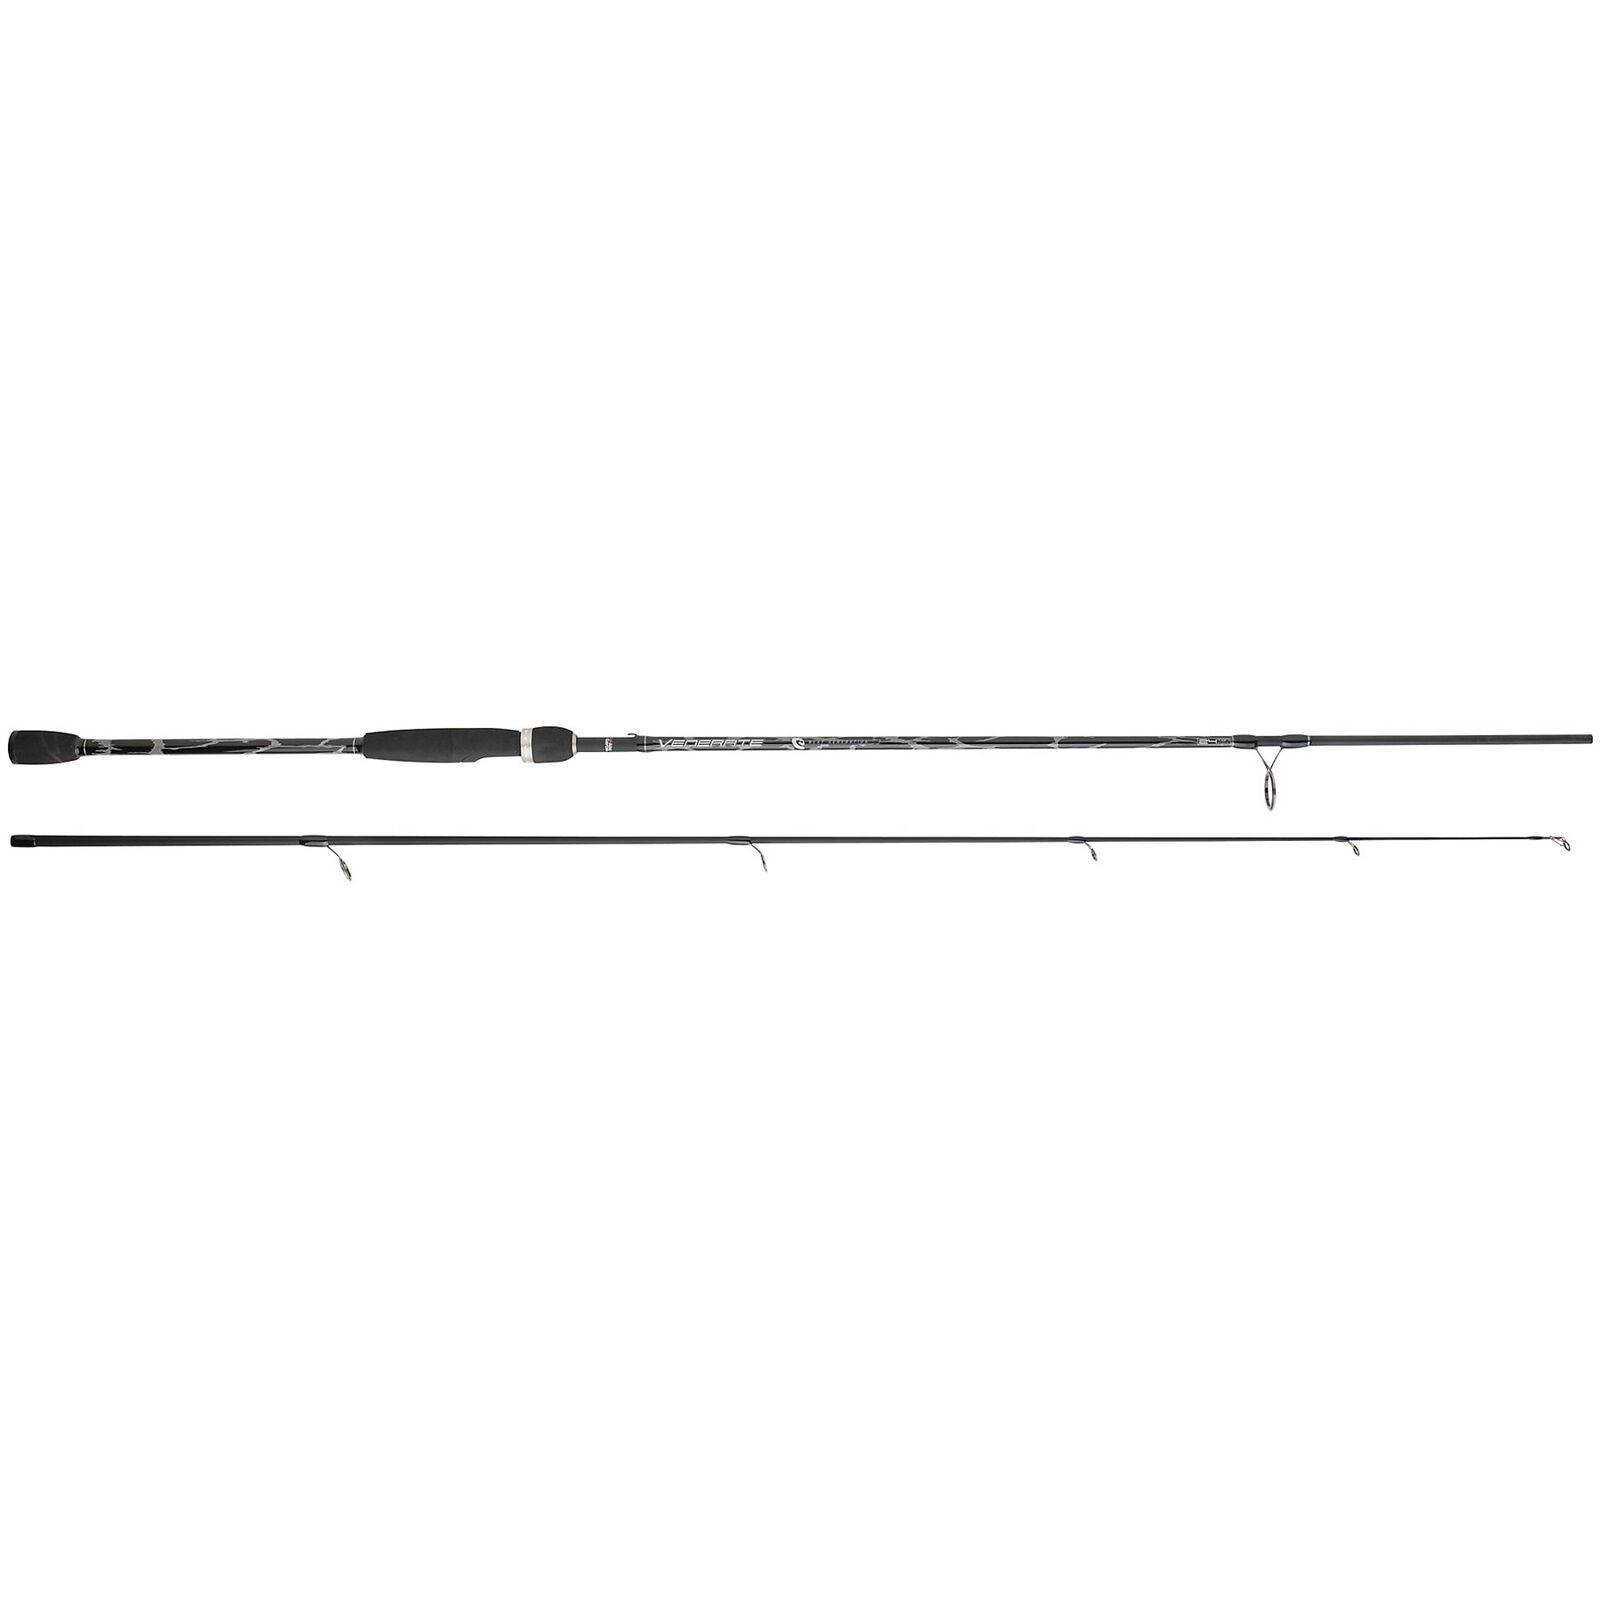 Abu Garcia Venerate 9' 15-45g   Fishing Spinning Rod